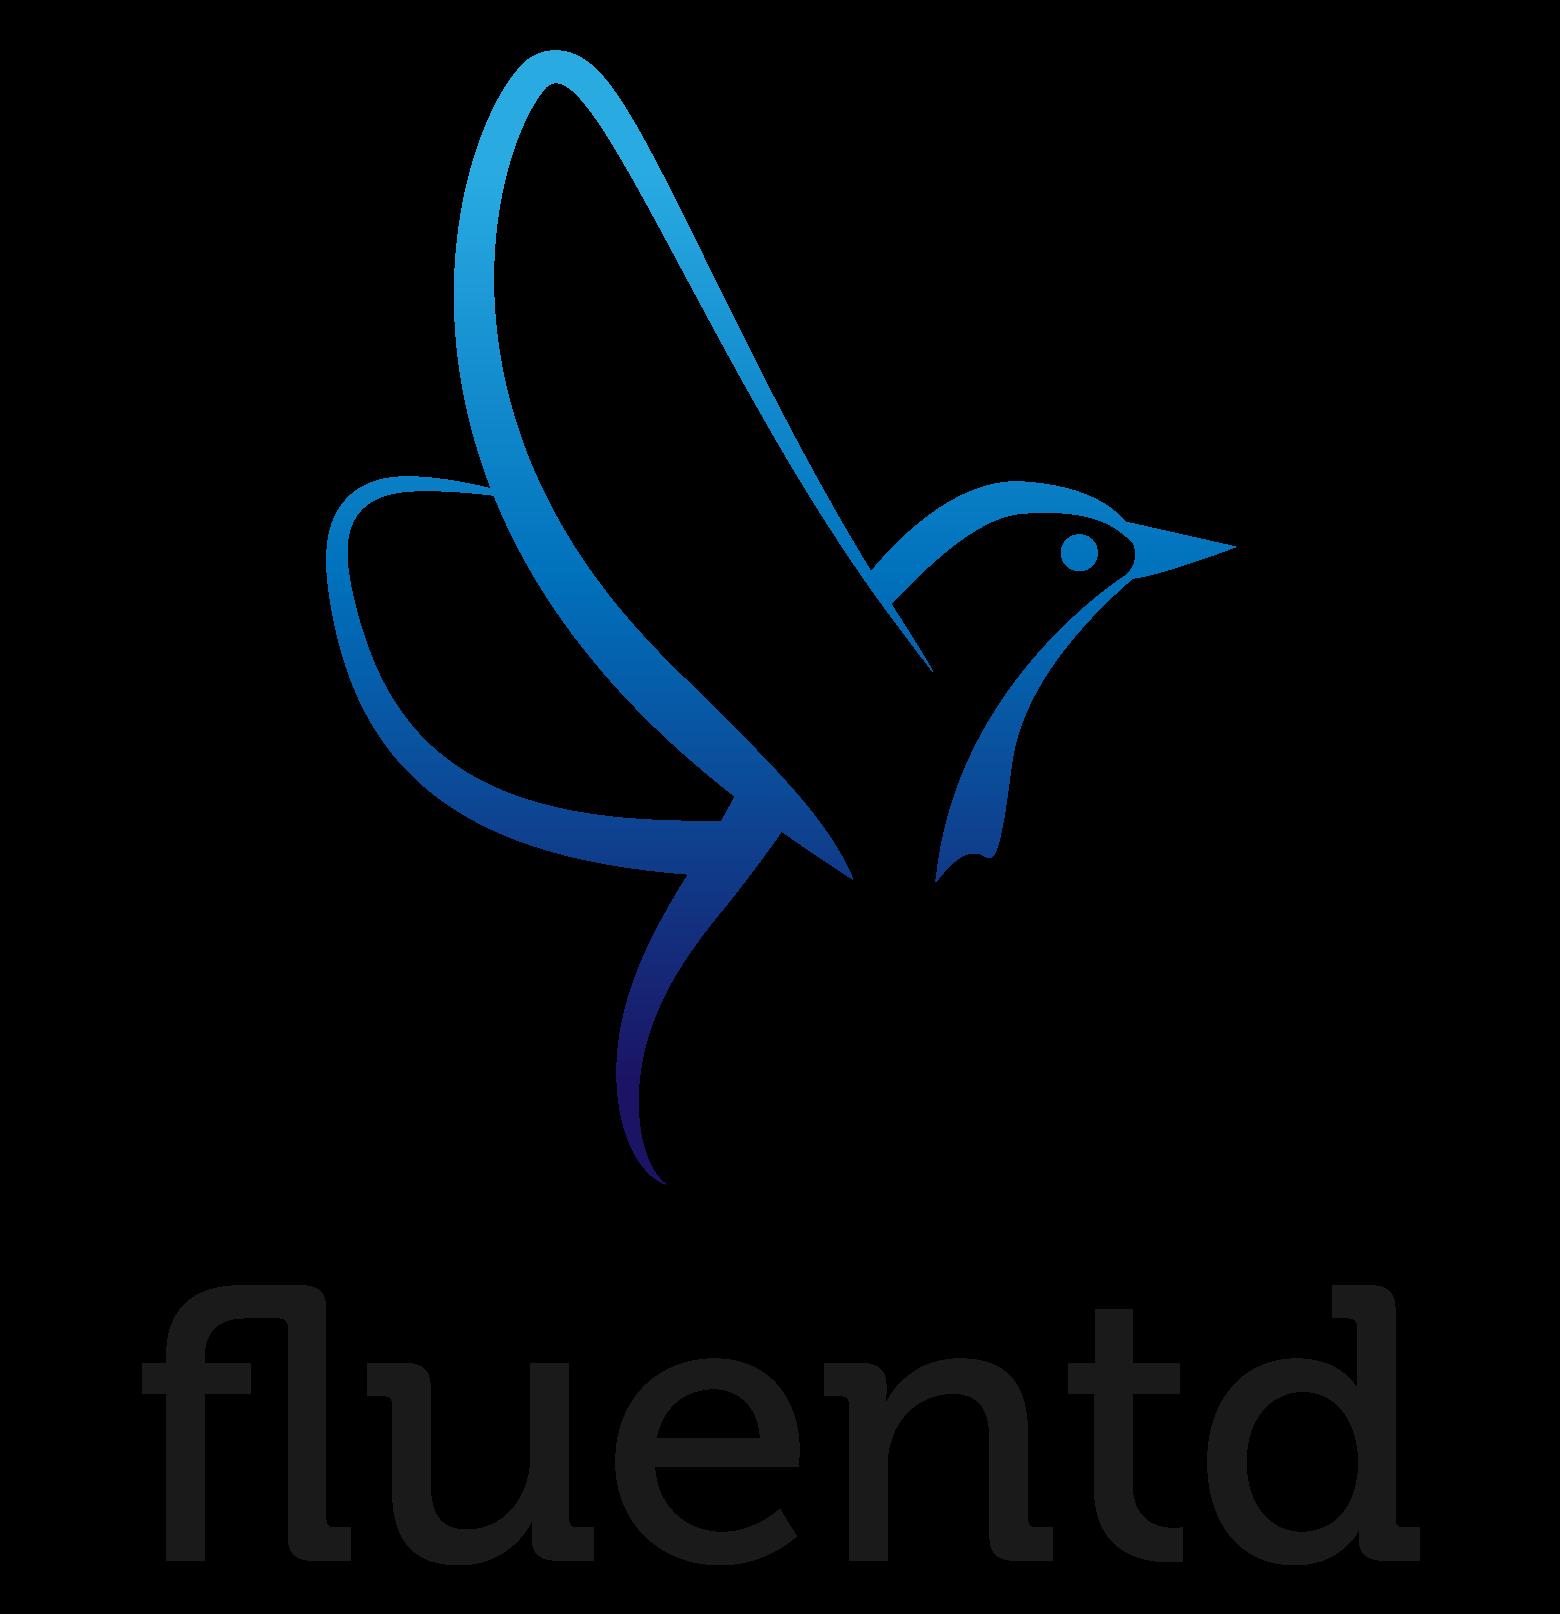 http://cl.ly/QDWQ/fluentd.png